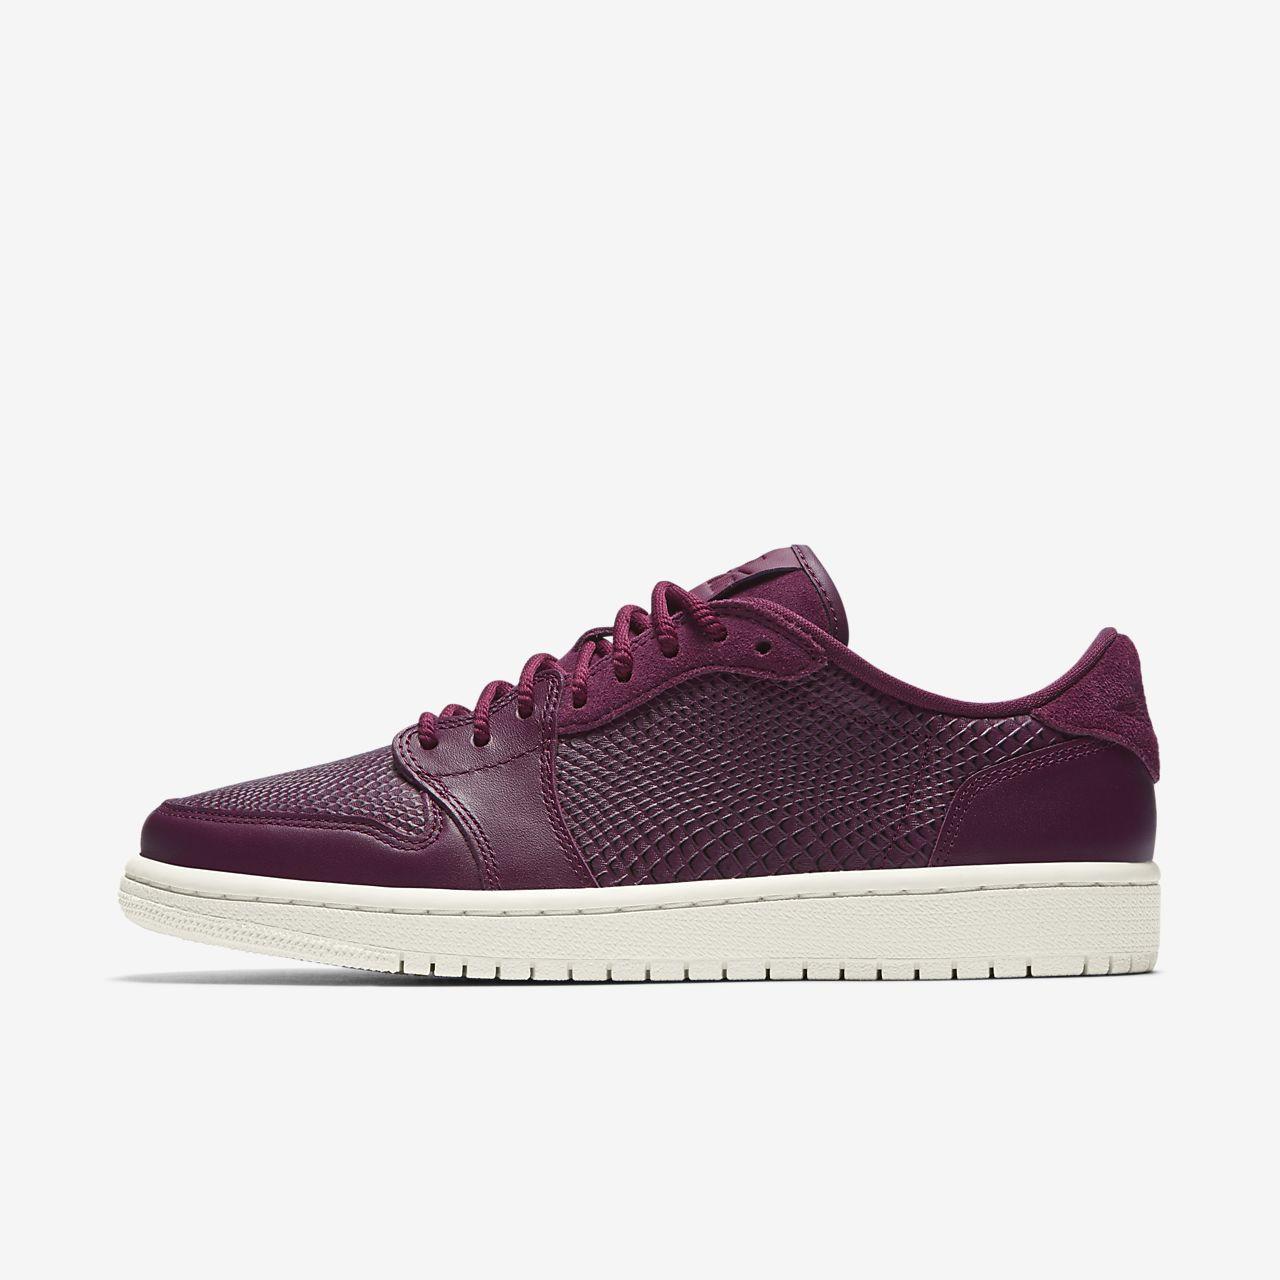 Air Jordan 1 Retro Low NS Women's Shoe